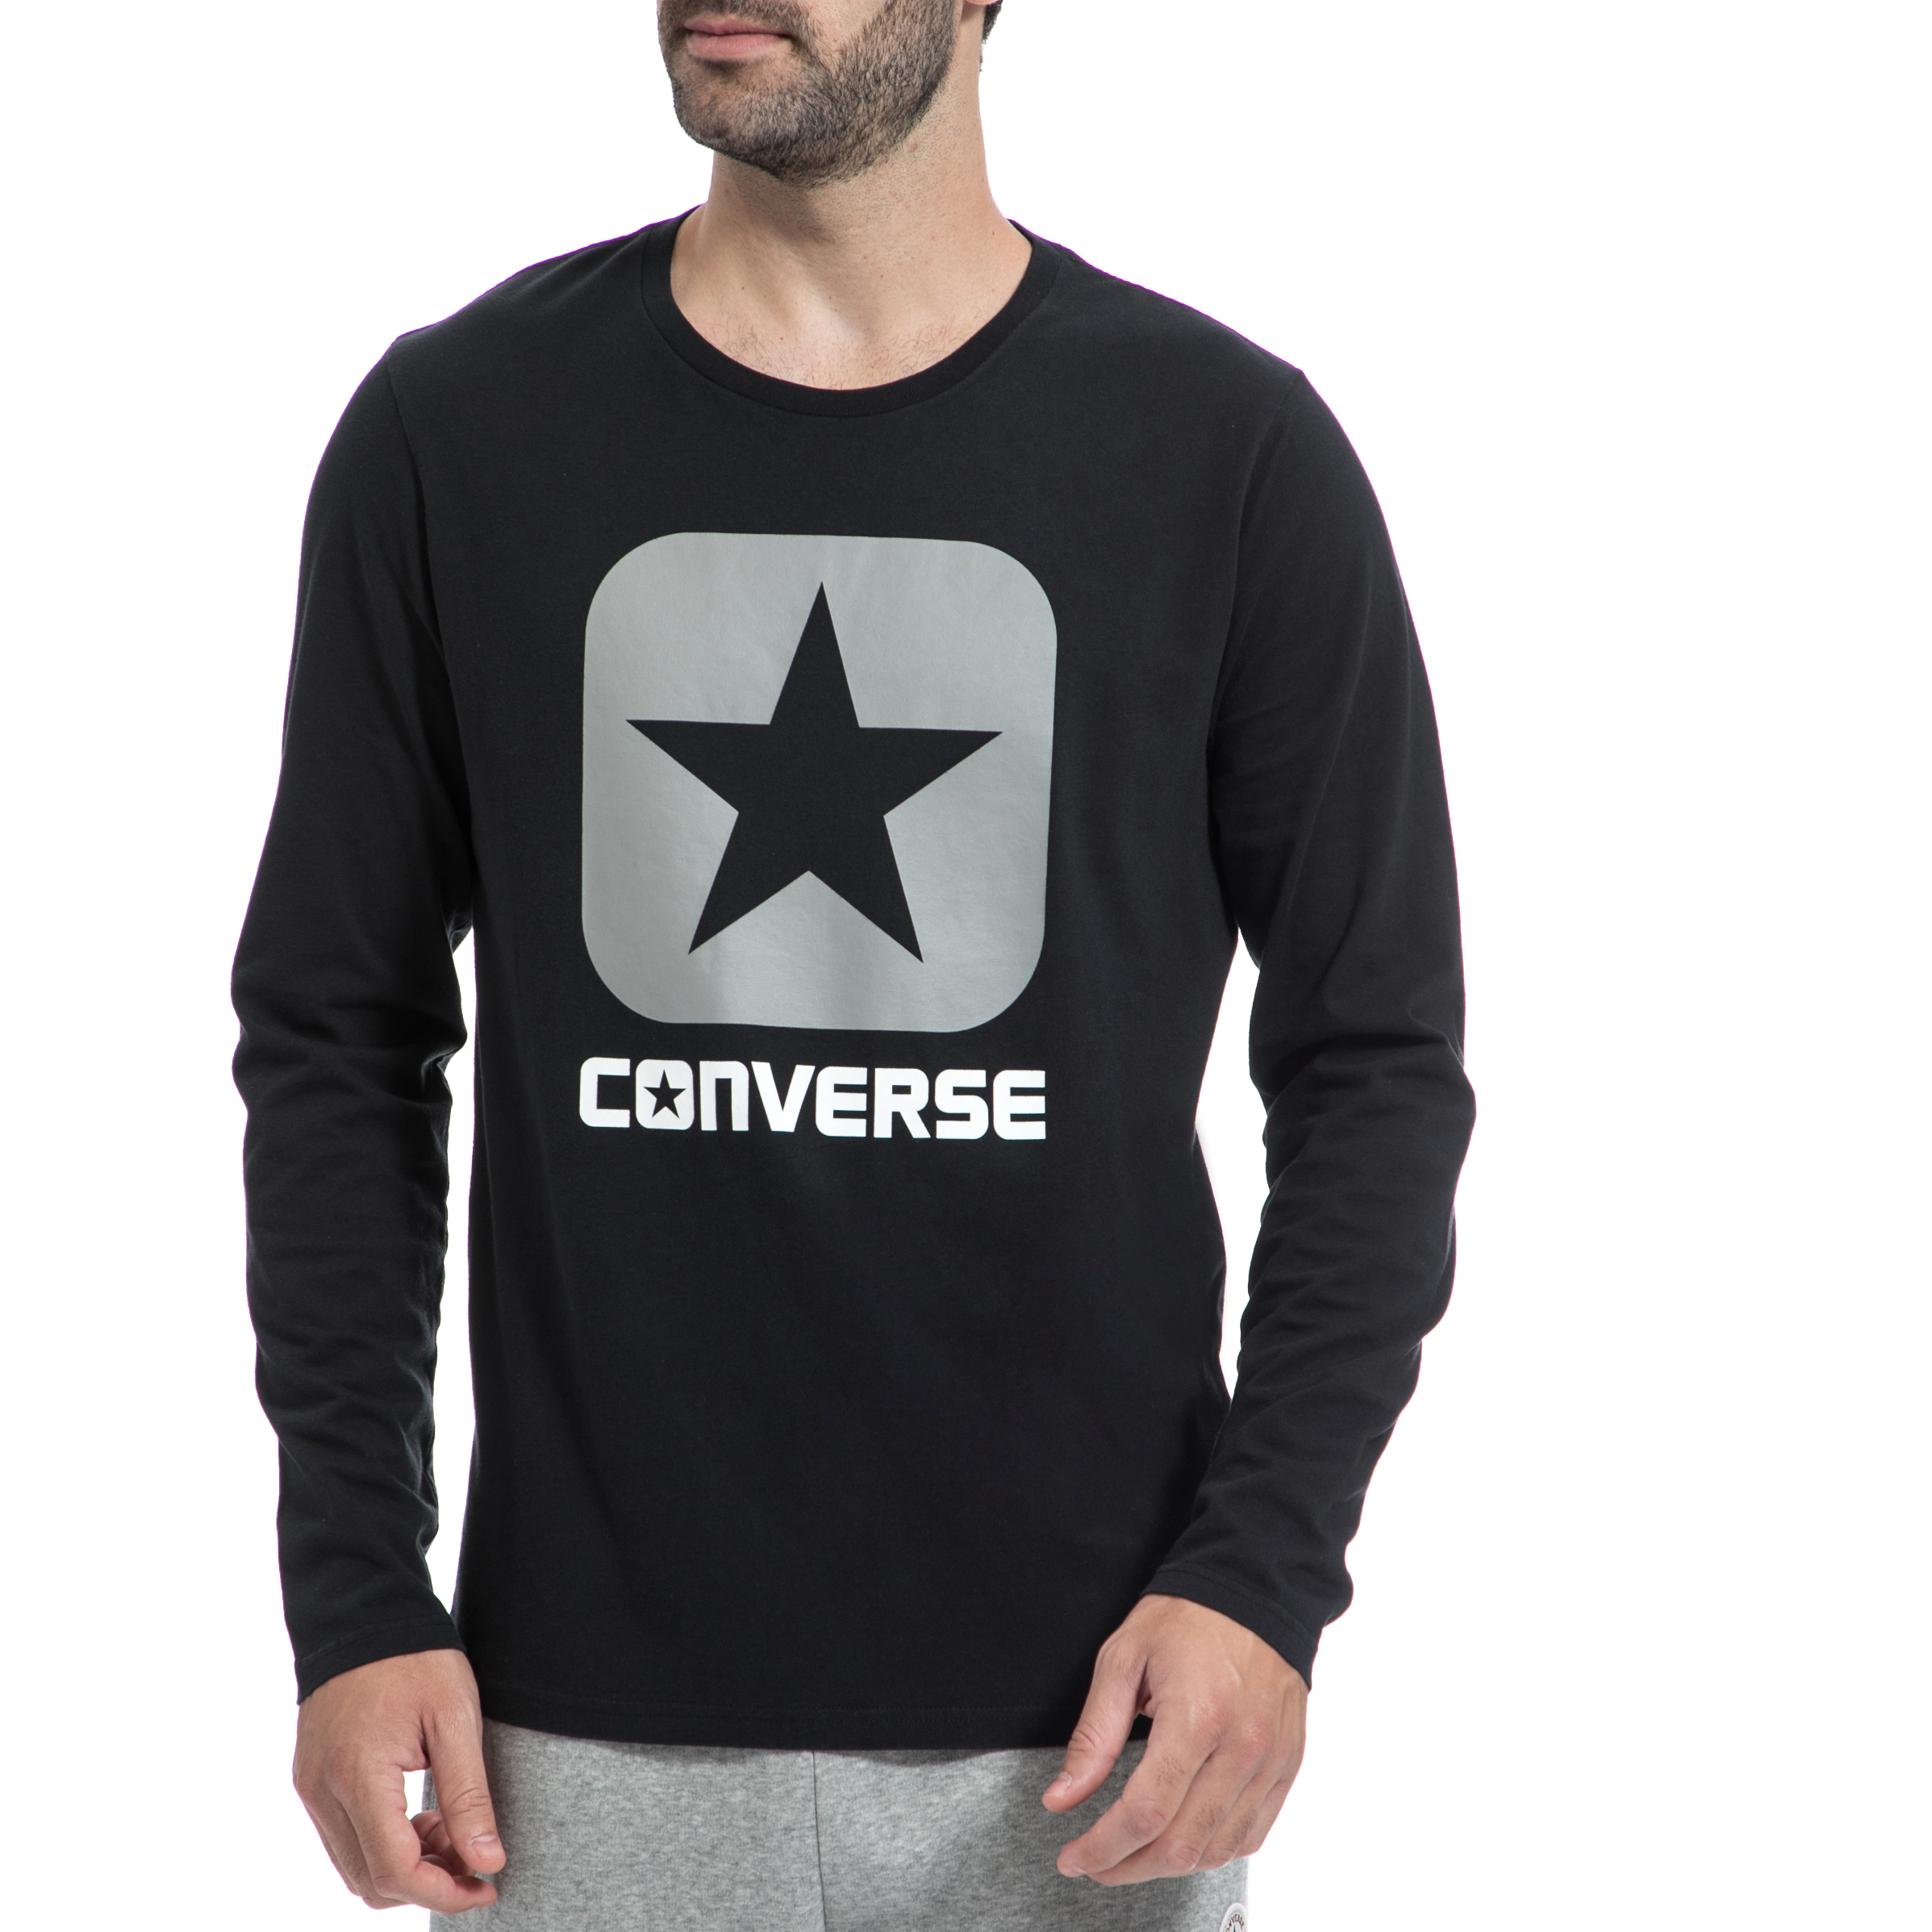 CONVERSE - Ανρική μπλούζα CONVERSE μαύρη ανδρικά ρούχα αθλητικά φούτερ μακρυμάνικα